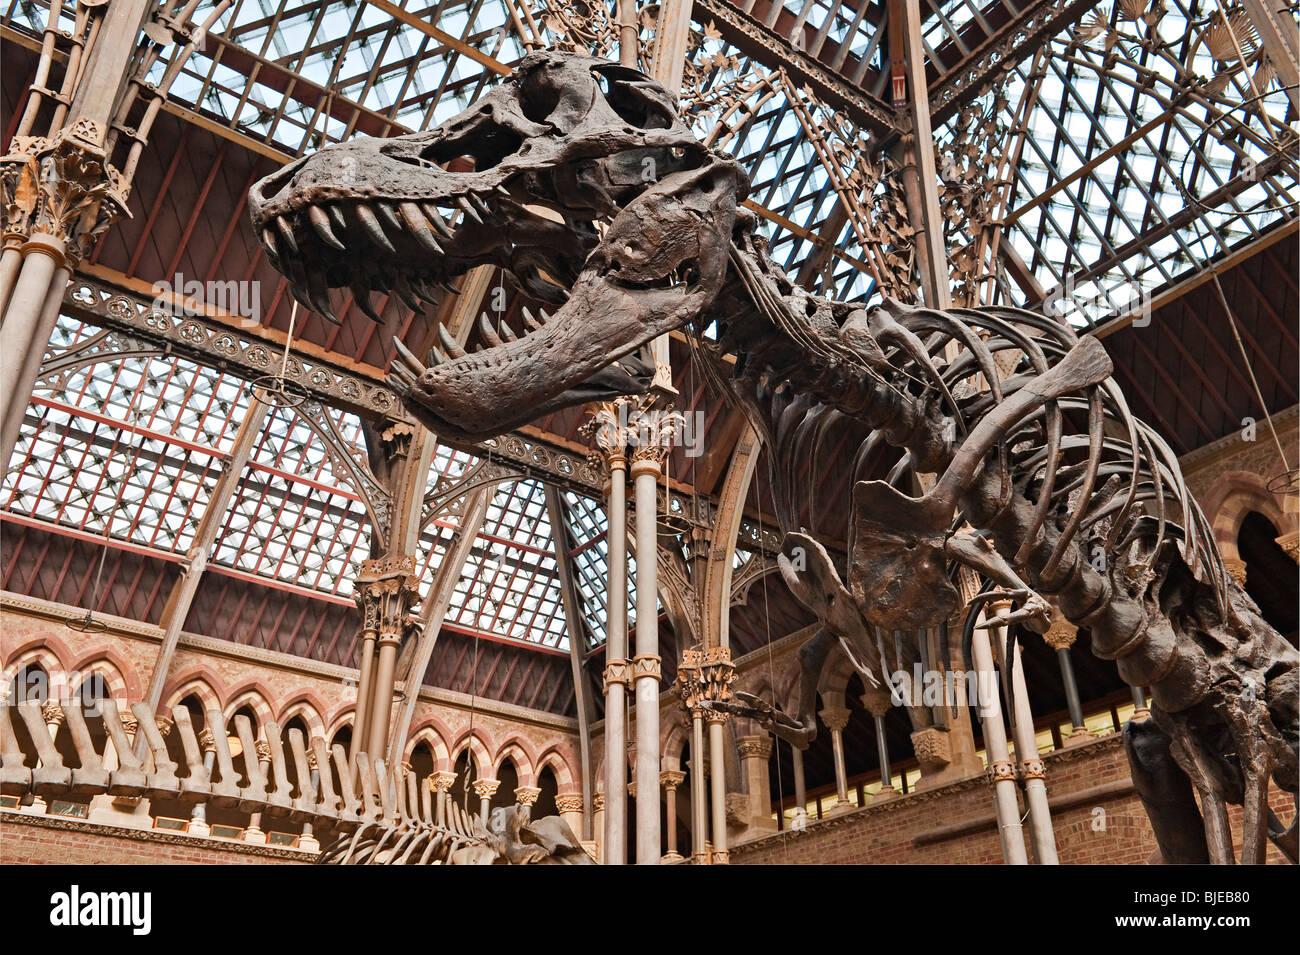 Natural History Museum Dinosaur Fossils